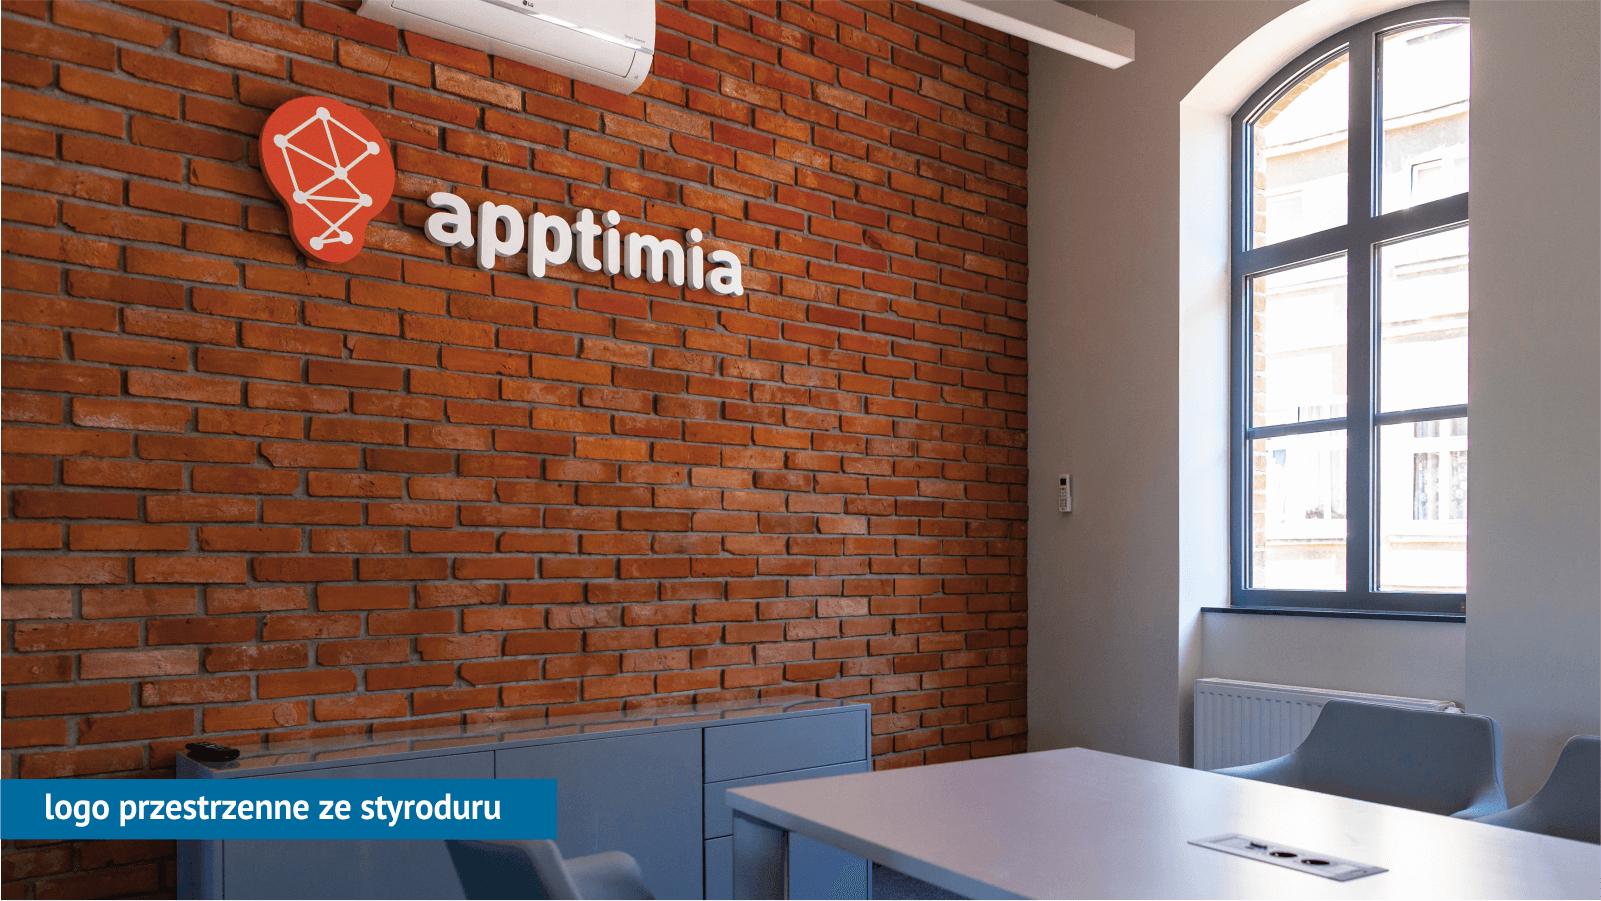 Apptimia Logo Styrodur